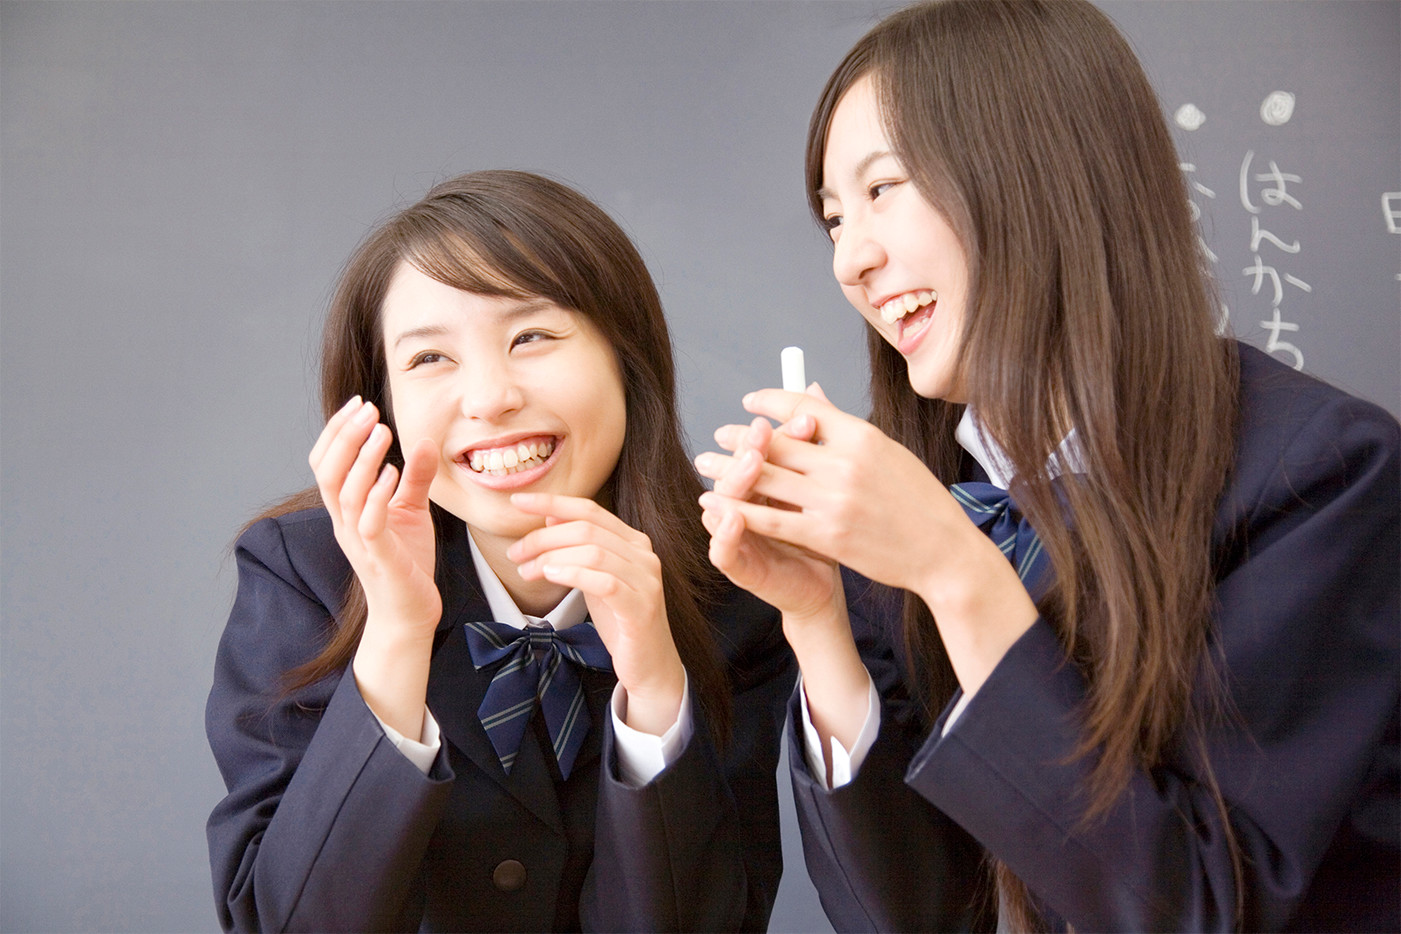 学習塾支援・高校3年生を対象としたAO入試、推薦入試対策・AO推薦個別講座